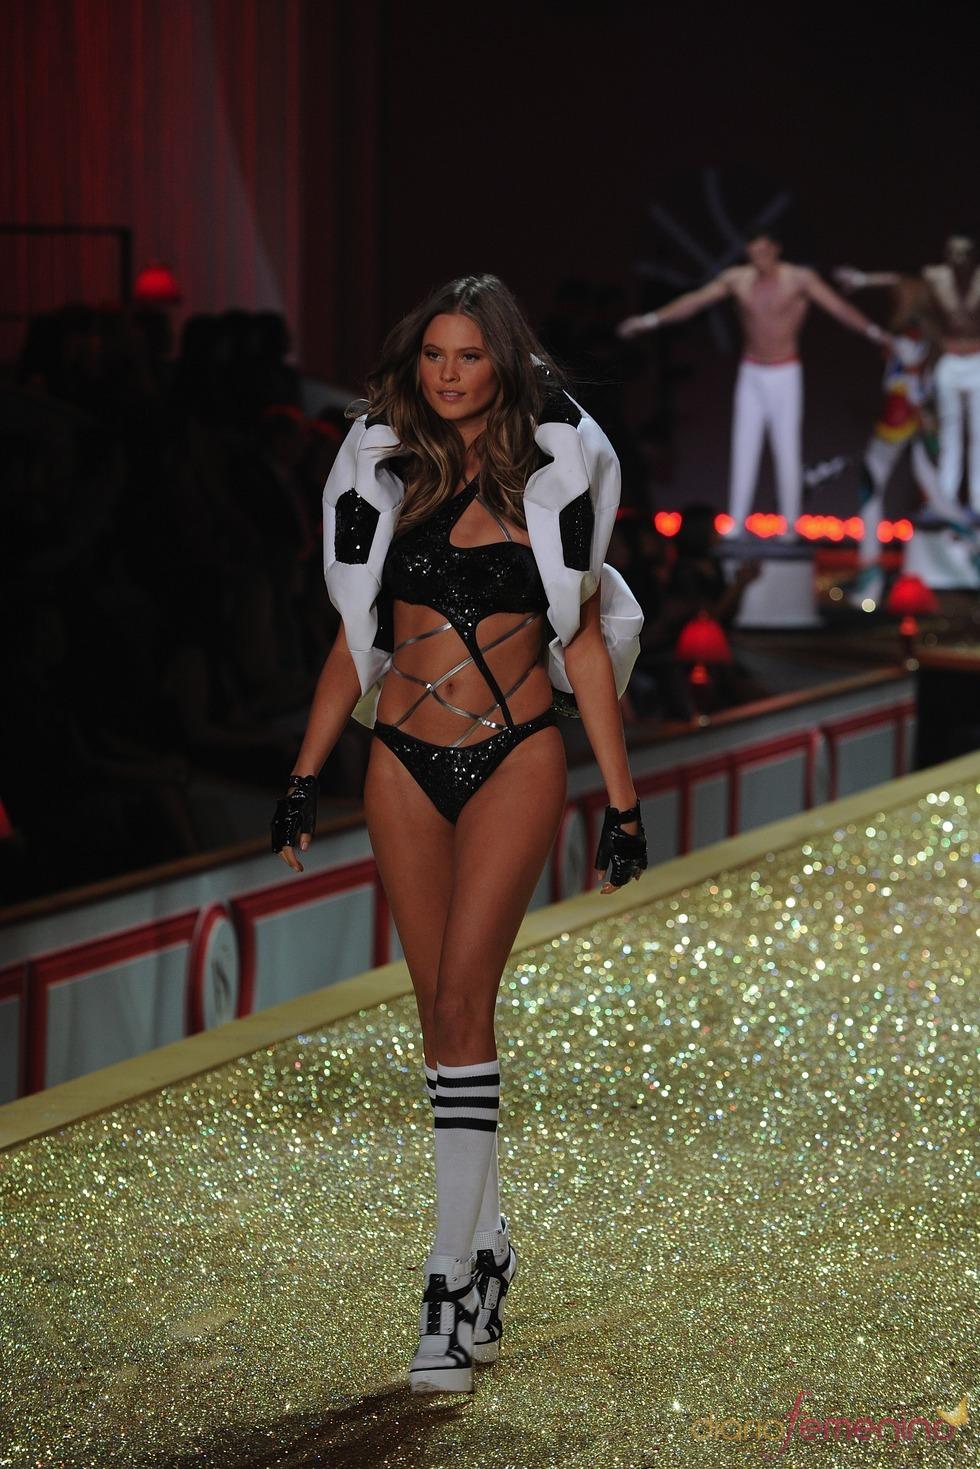 La firma americana Victoria's Secret presenta un espectacular desfile